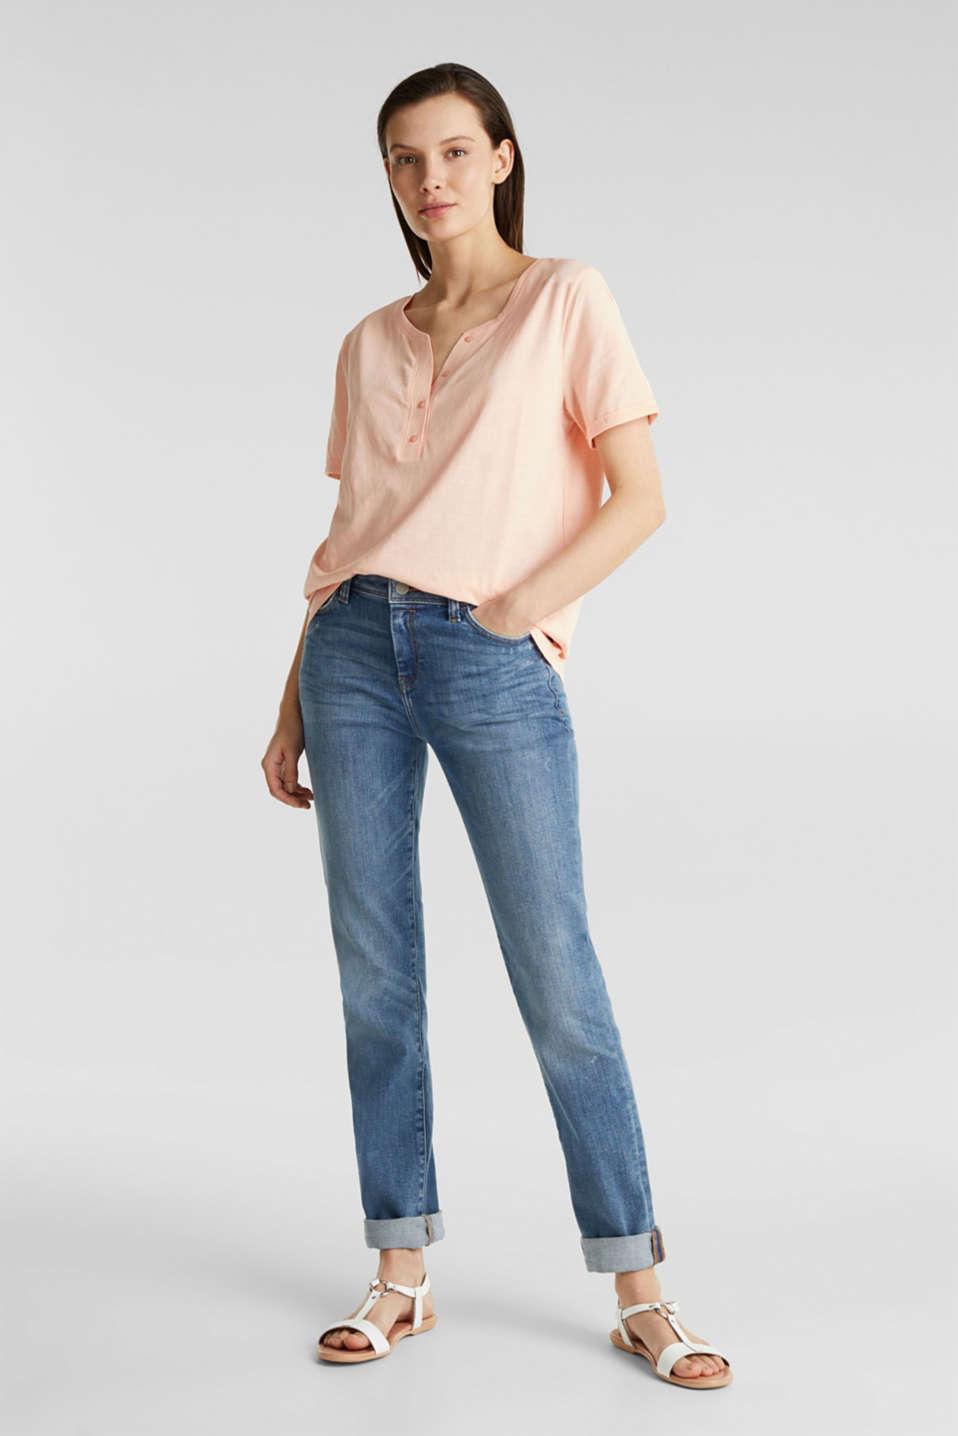 100% cotton Henley T-shirt, PEACH 4, detail image number 1